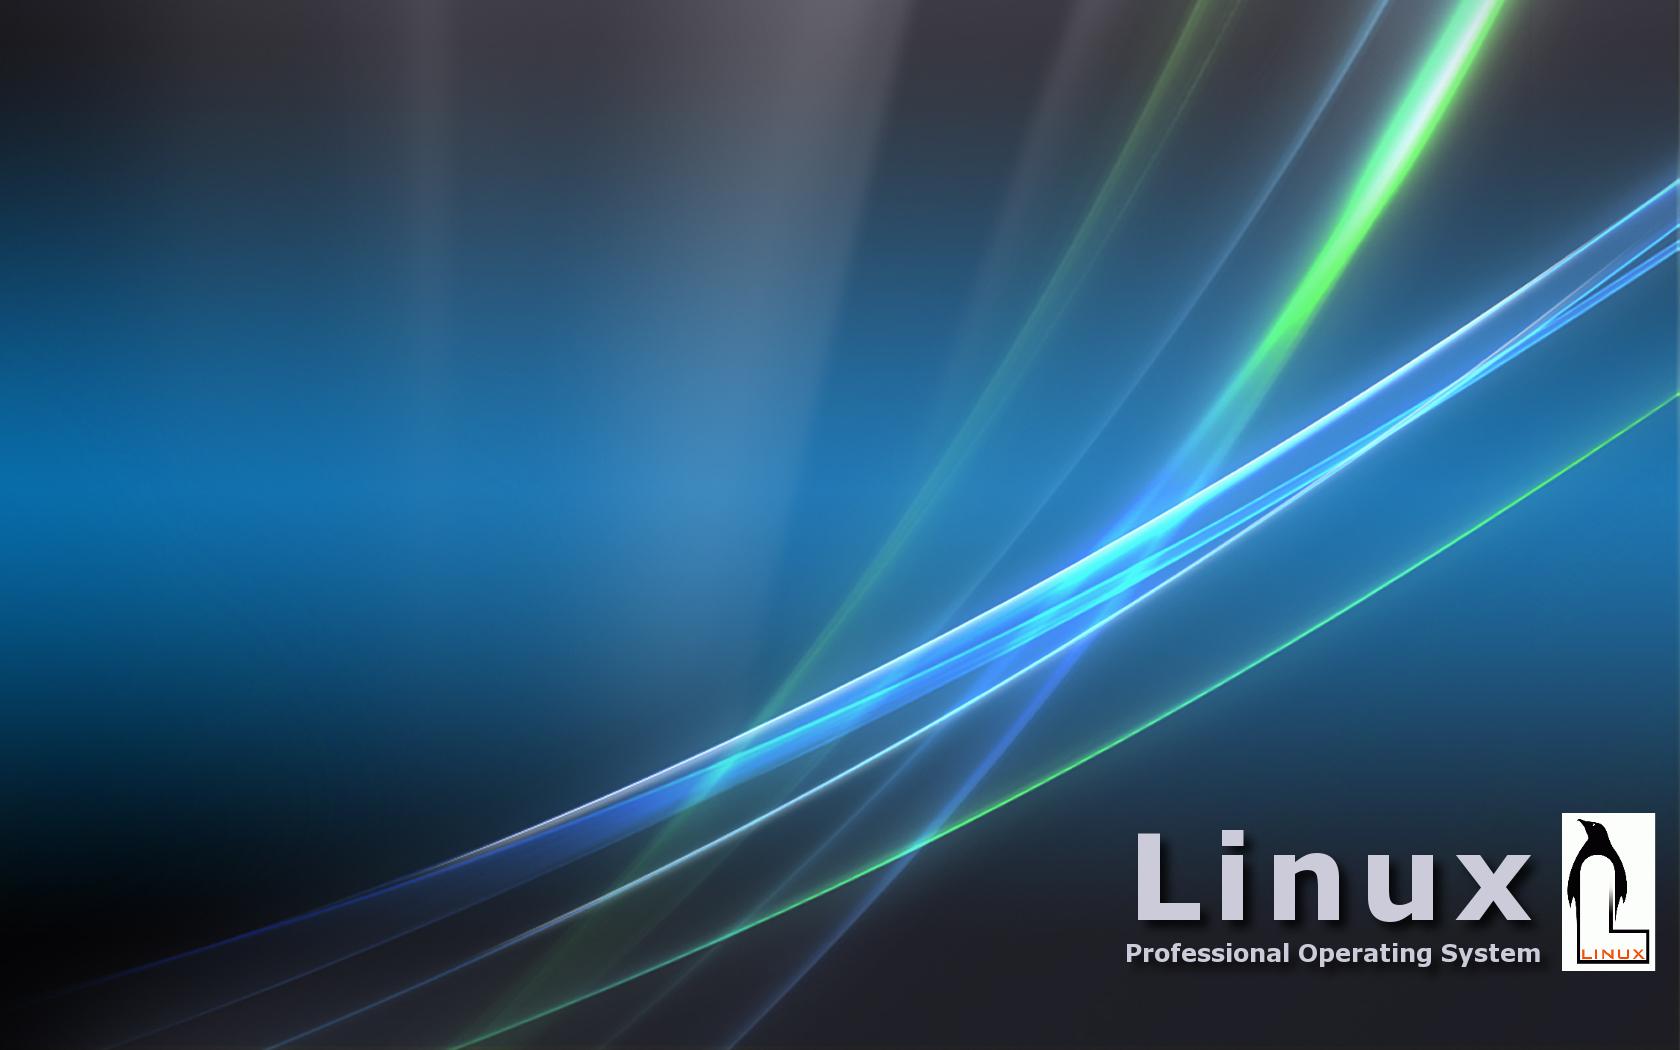 Desk top widescreen wallpaper Linux with Vista design 1680x1050